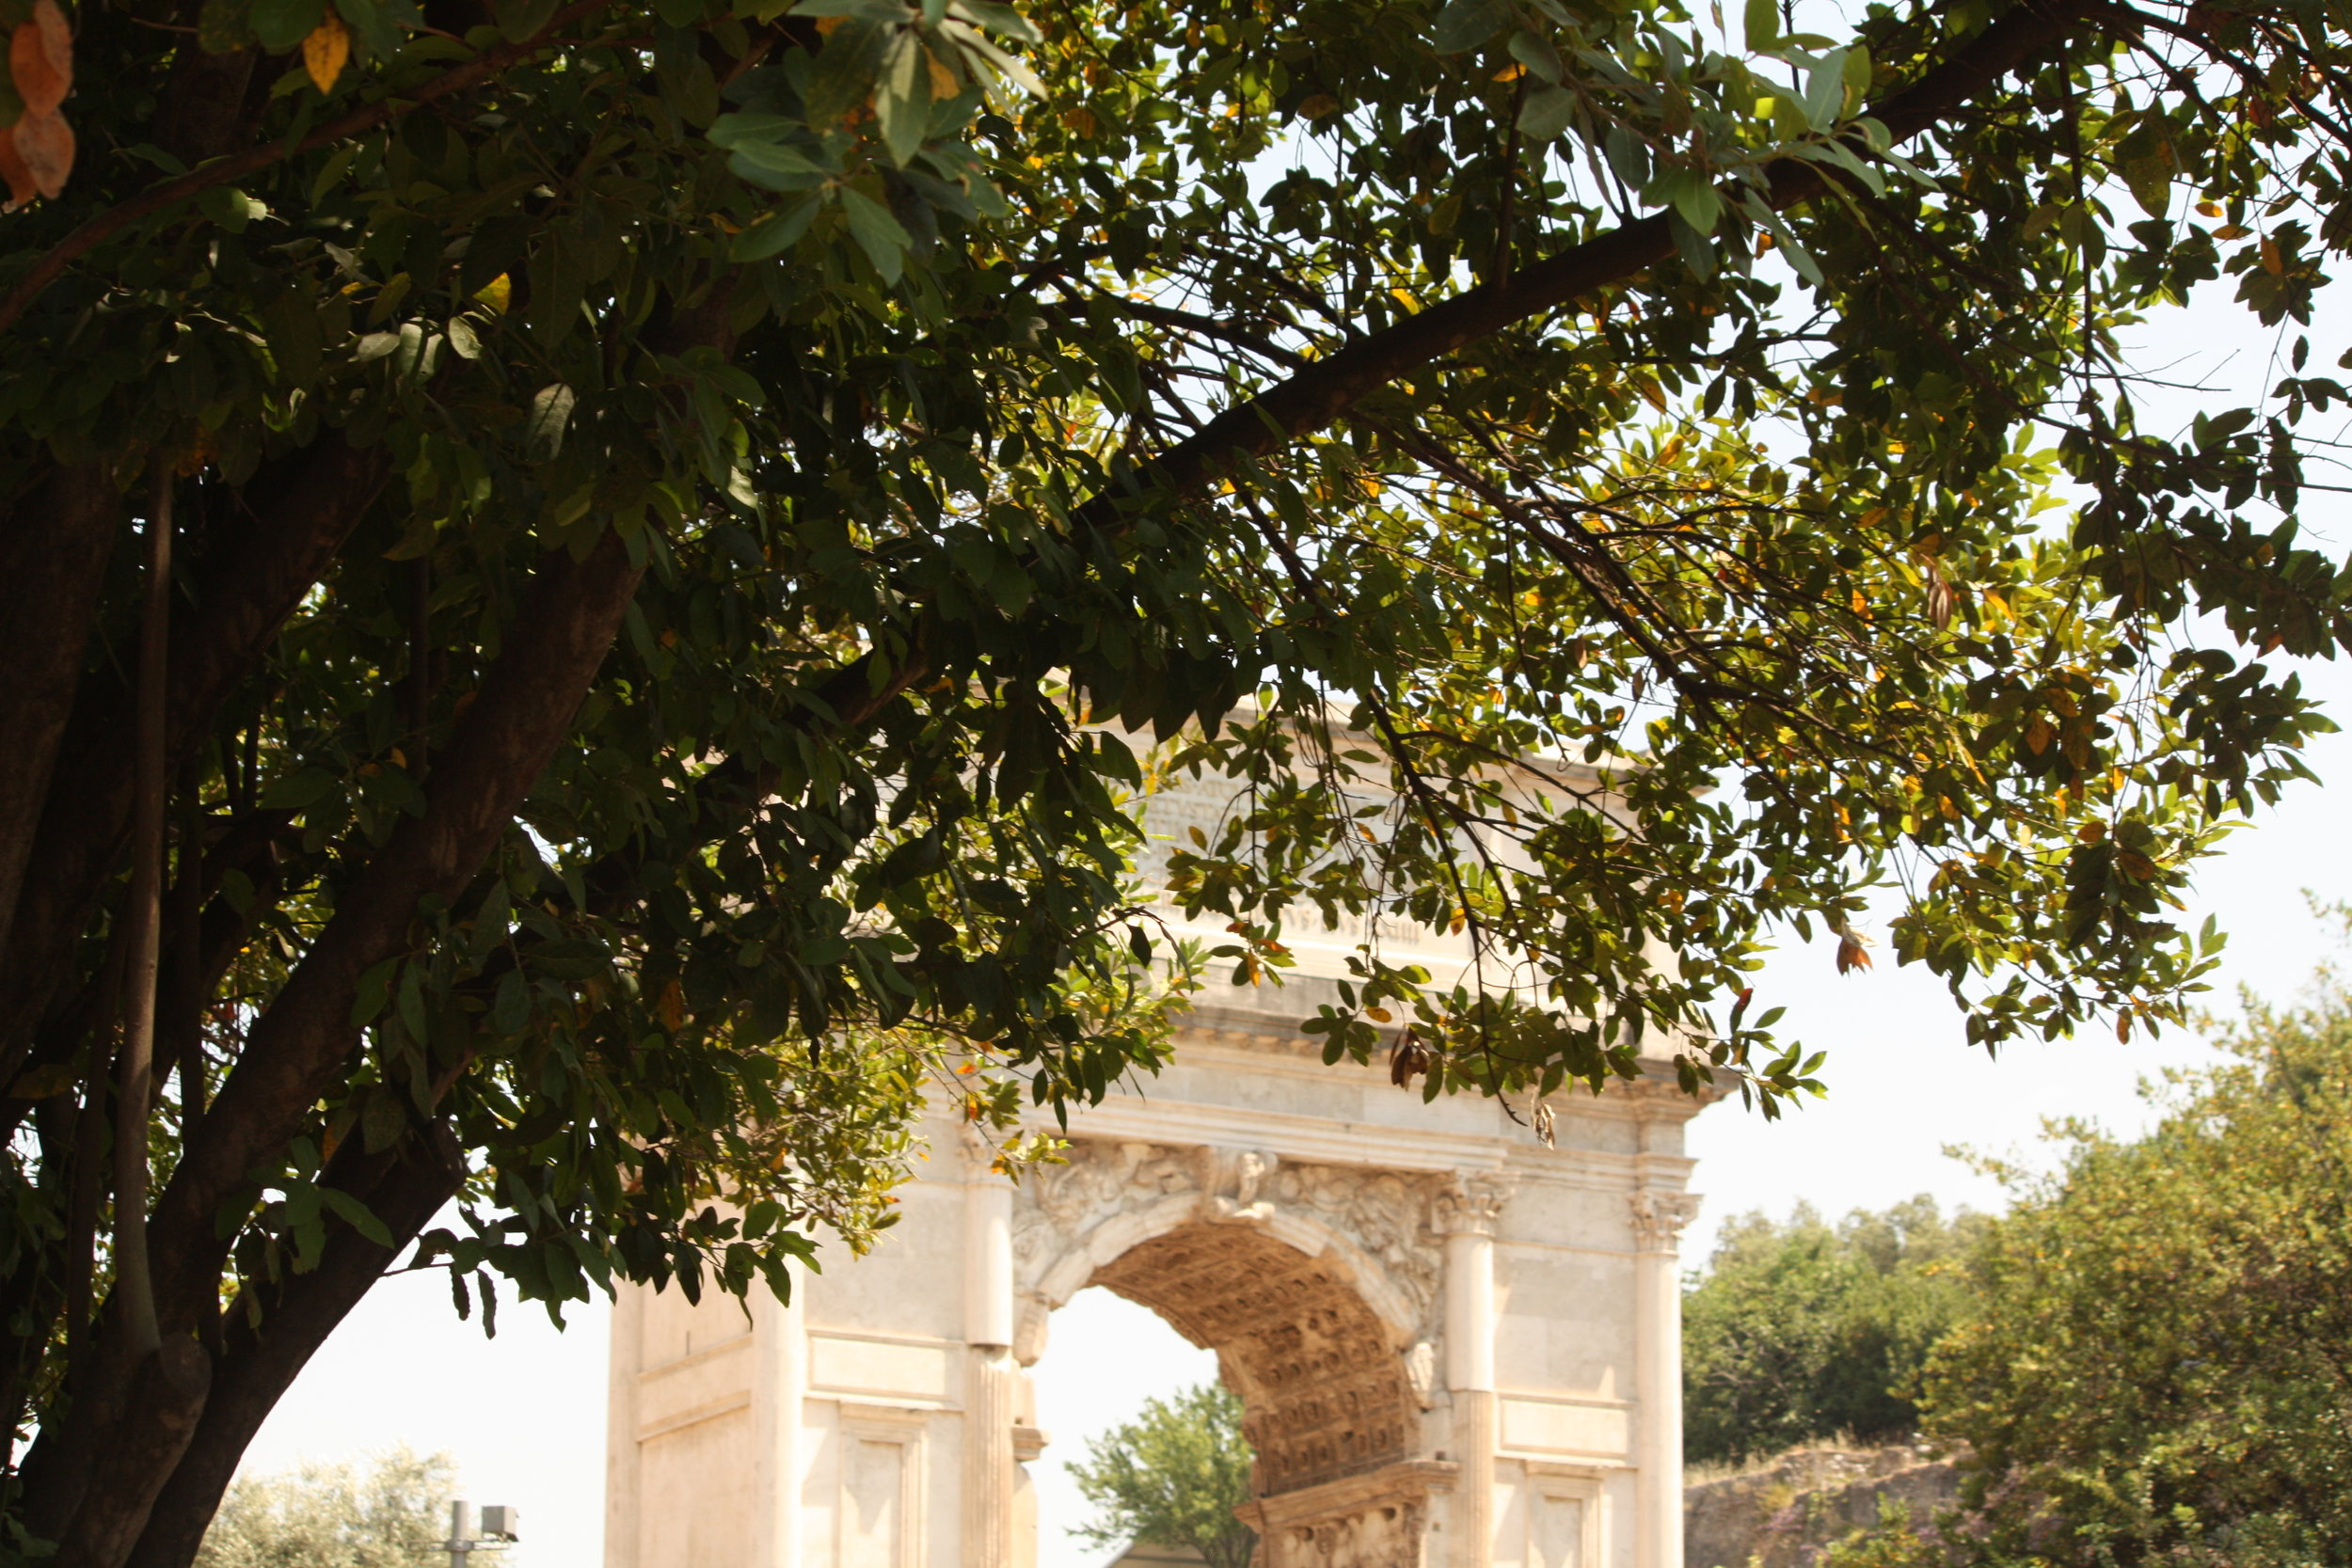 Roman Road, Rome, Italy: June 2017